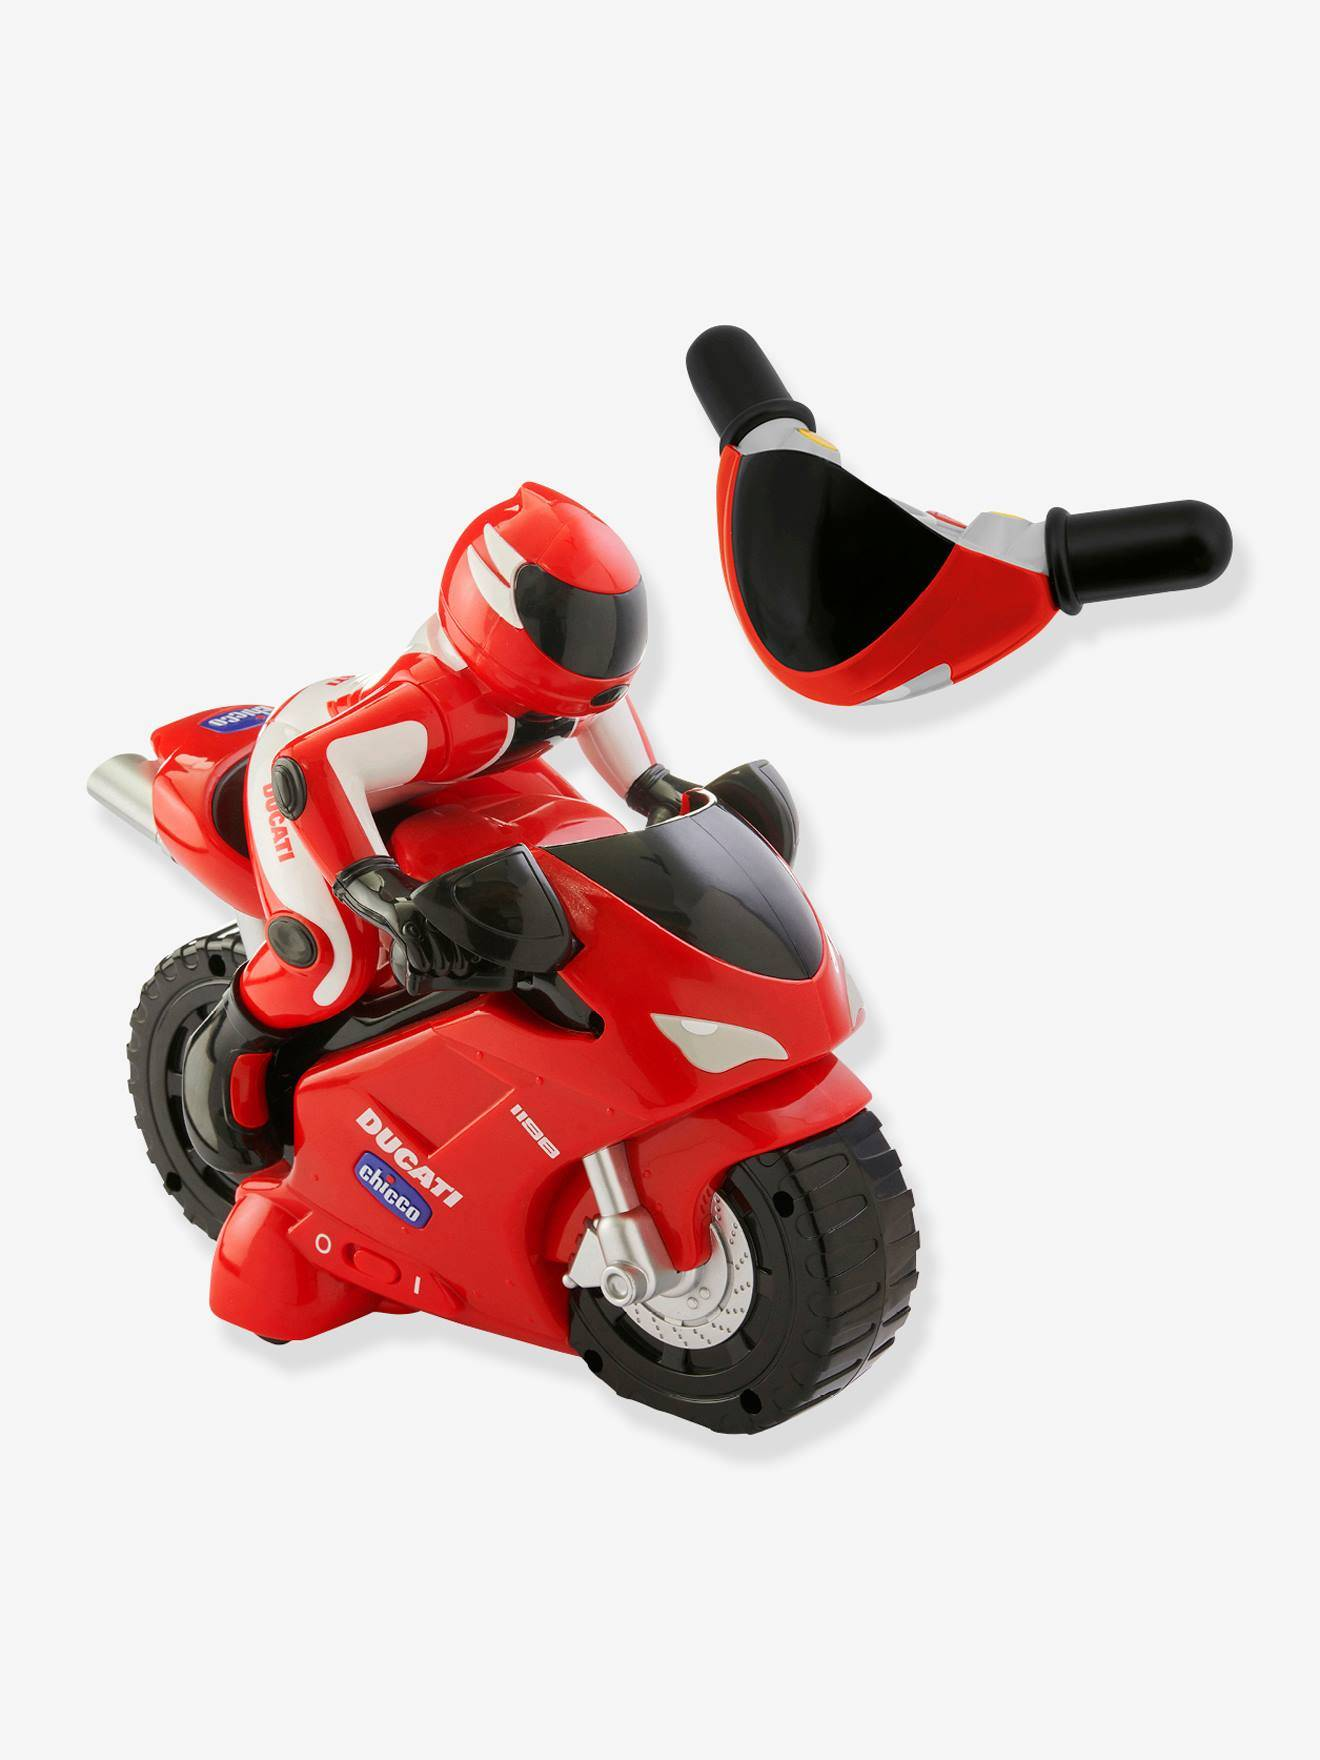 CHICCO Moto Ducati 1198 Chicco rojo fuerte metalizado